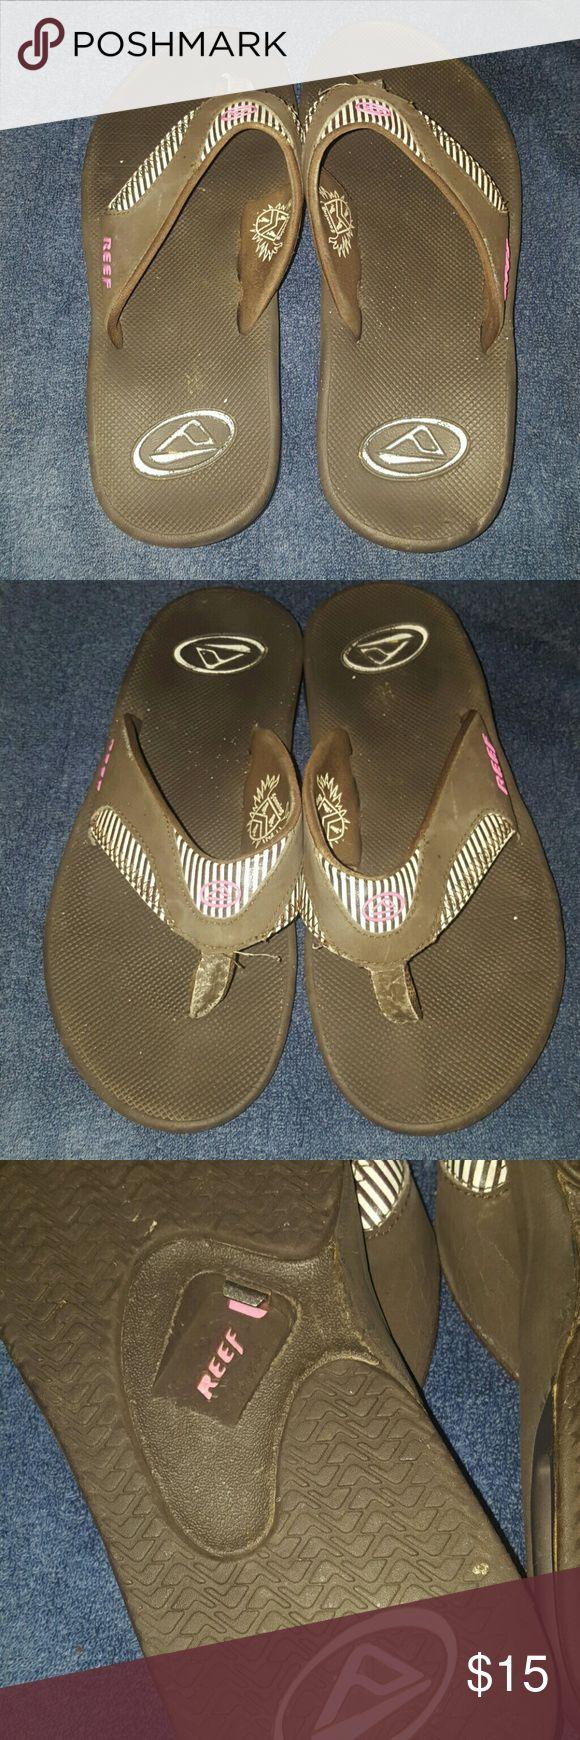 Reef Flip Flops Reef Women's Flip Flops with bottle opener on the bottom of the shoe. Reef Shoes Sandals